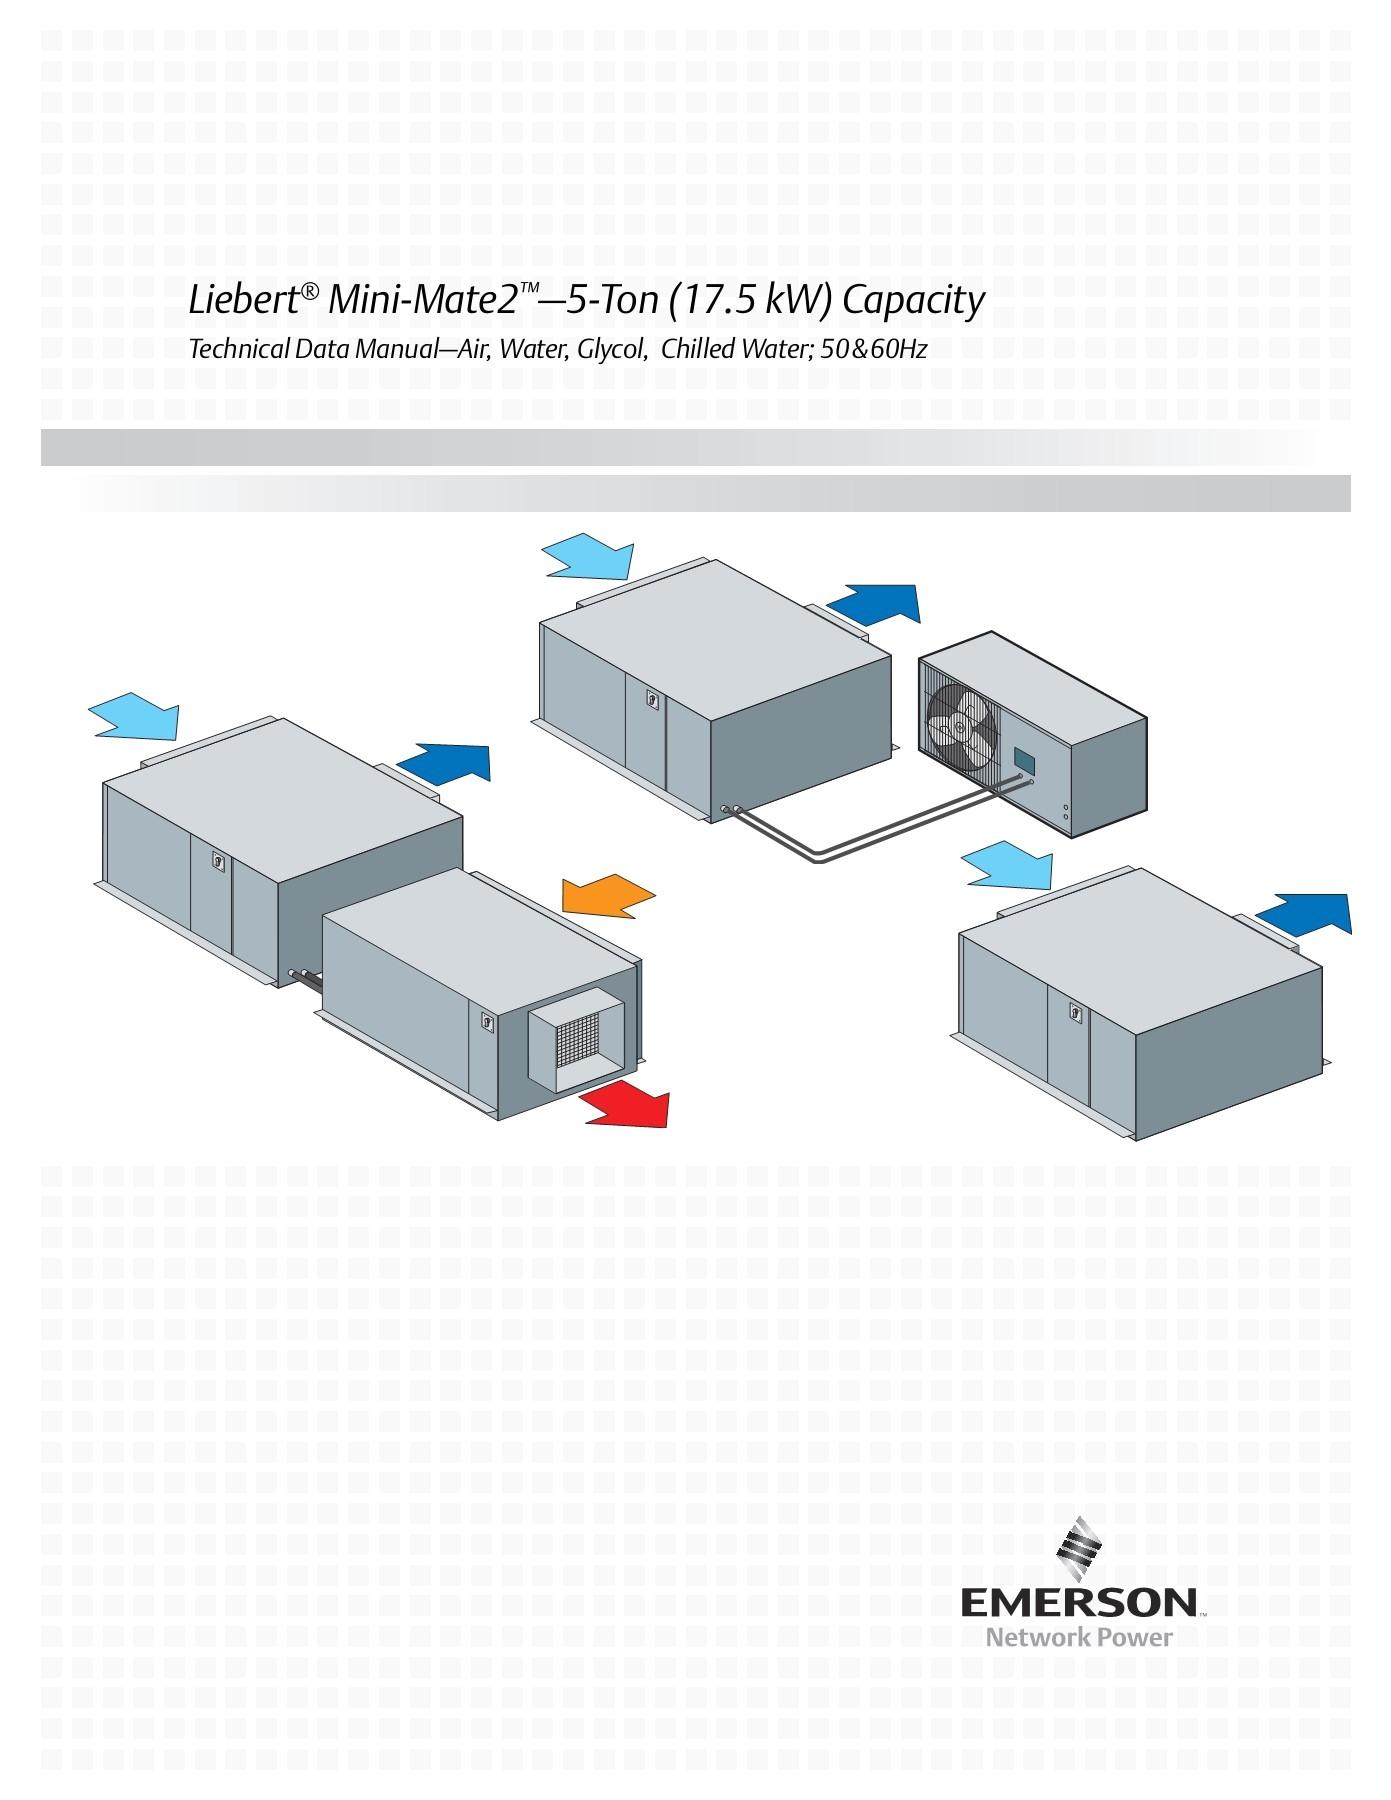 Liebert Mini Mate Wiring Diagram Liebert Mini Mate2 5 ton 17 5 Kw Capacity Pages 1 50 Text